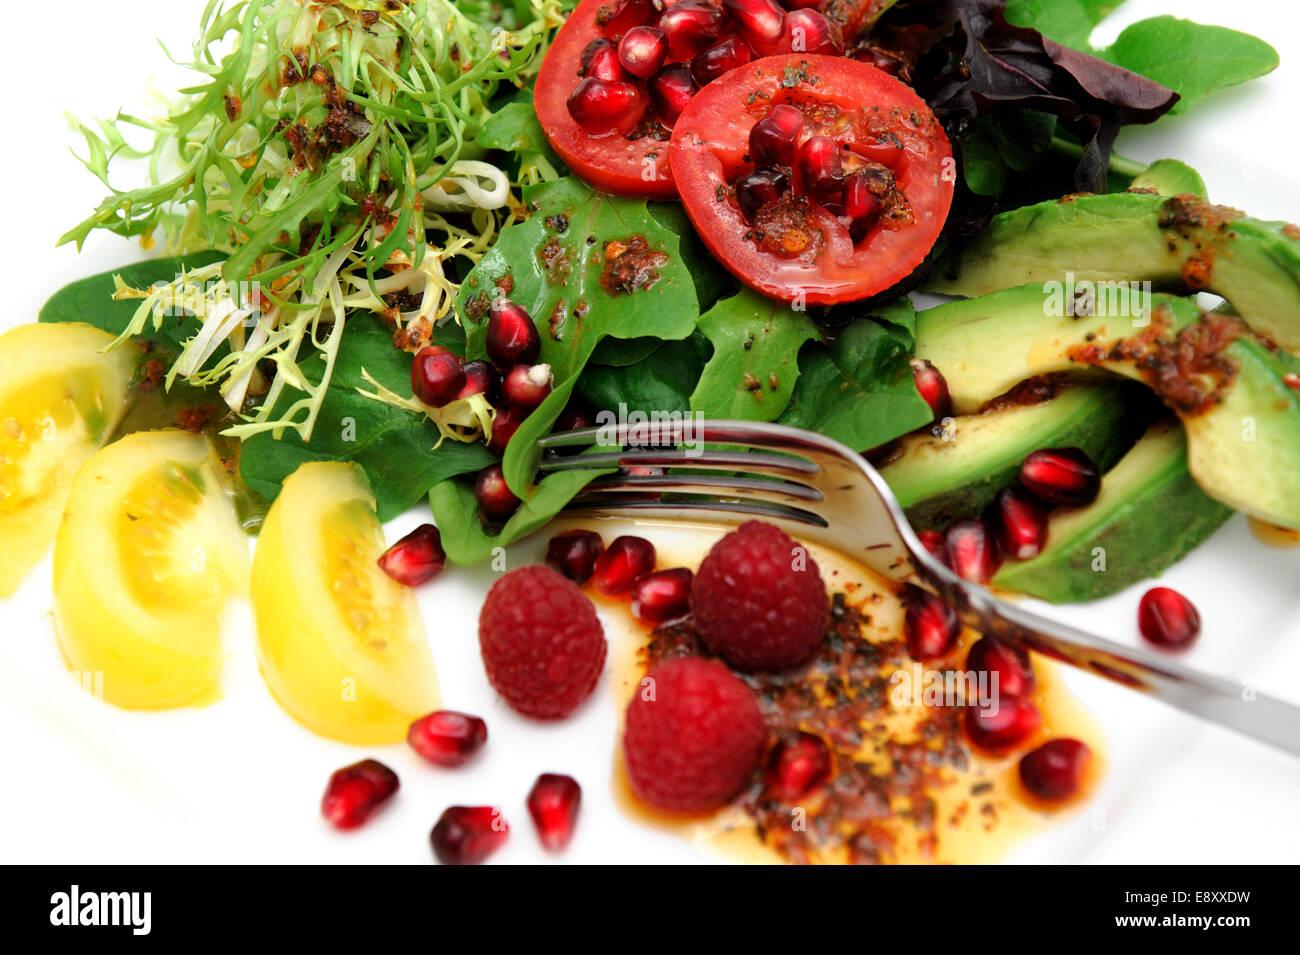 Exotic Salad - Stock Image